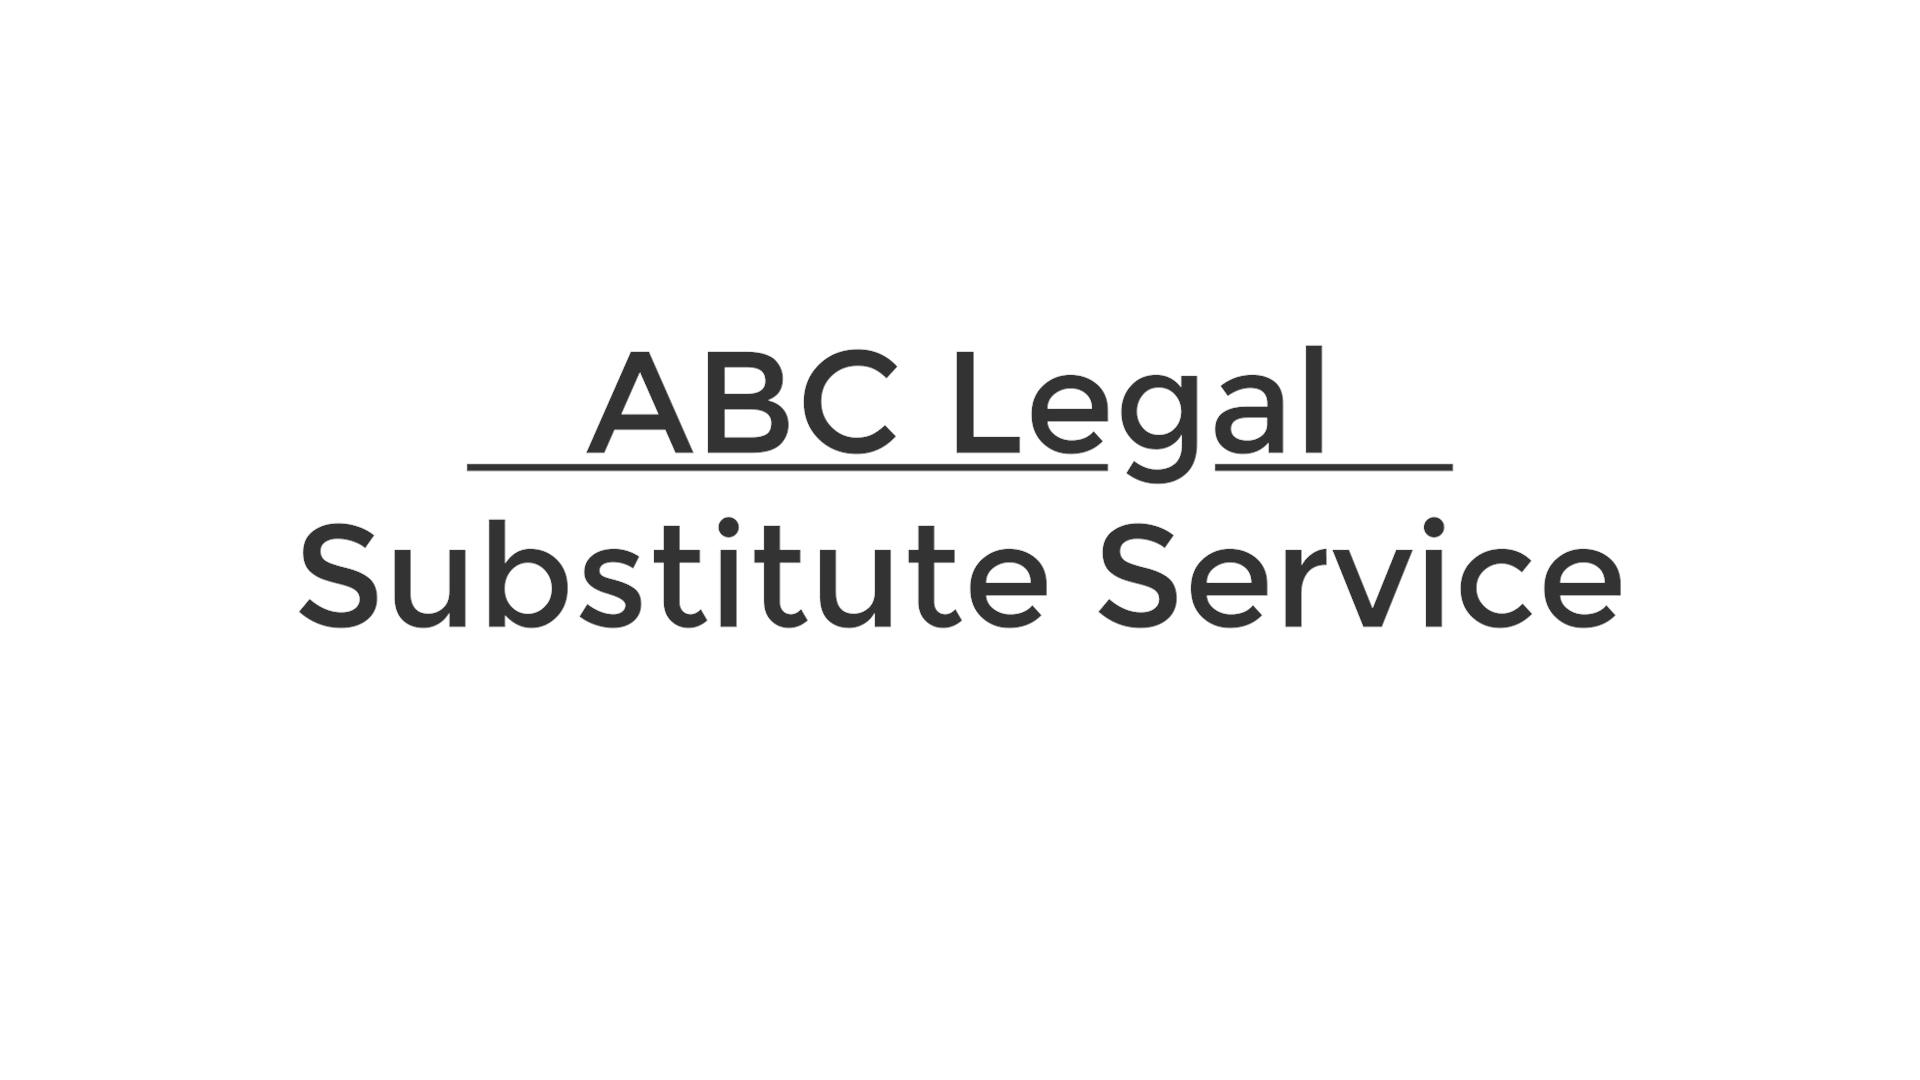 Sub Service 4.22.2021